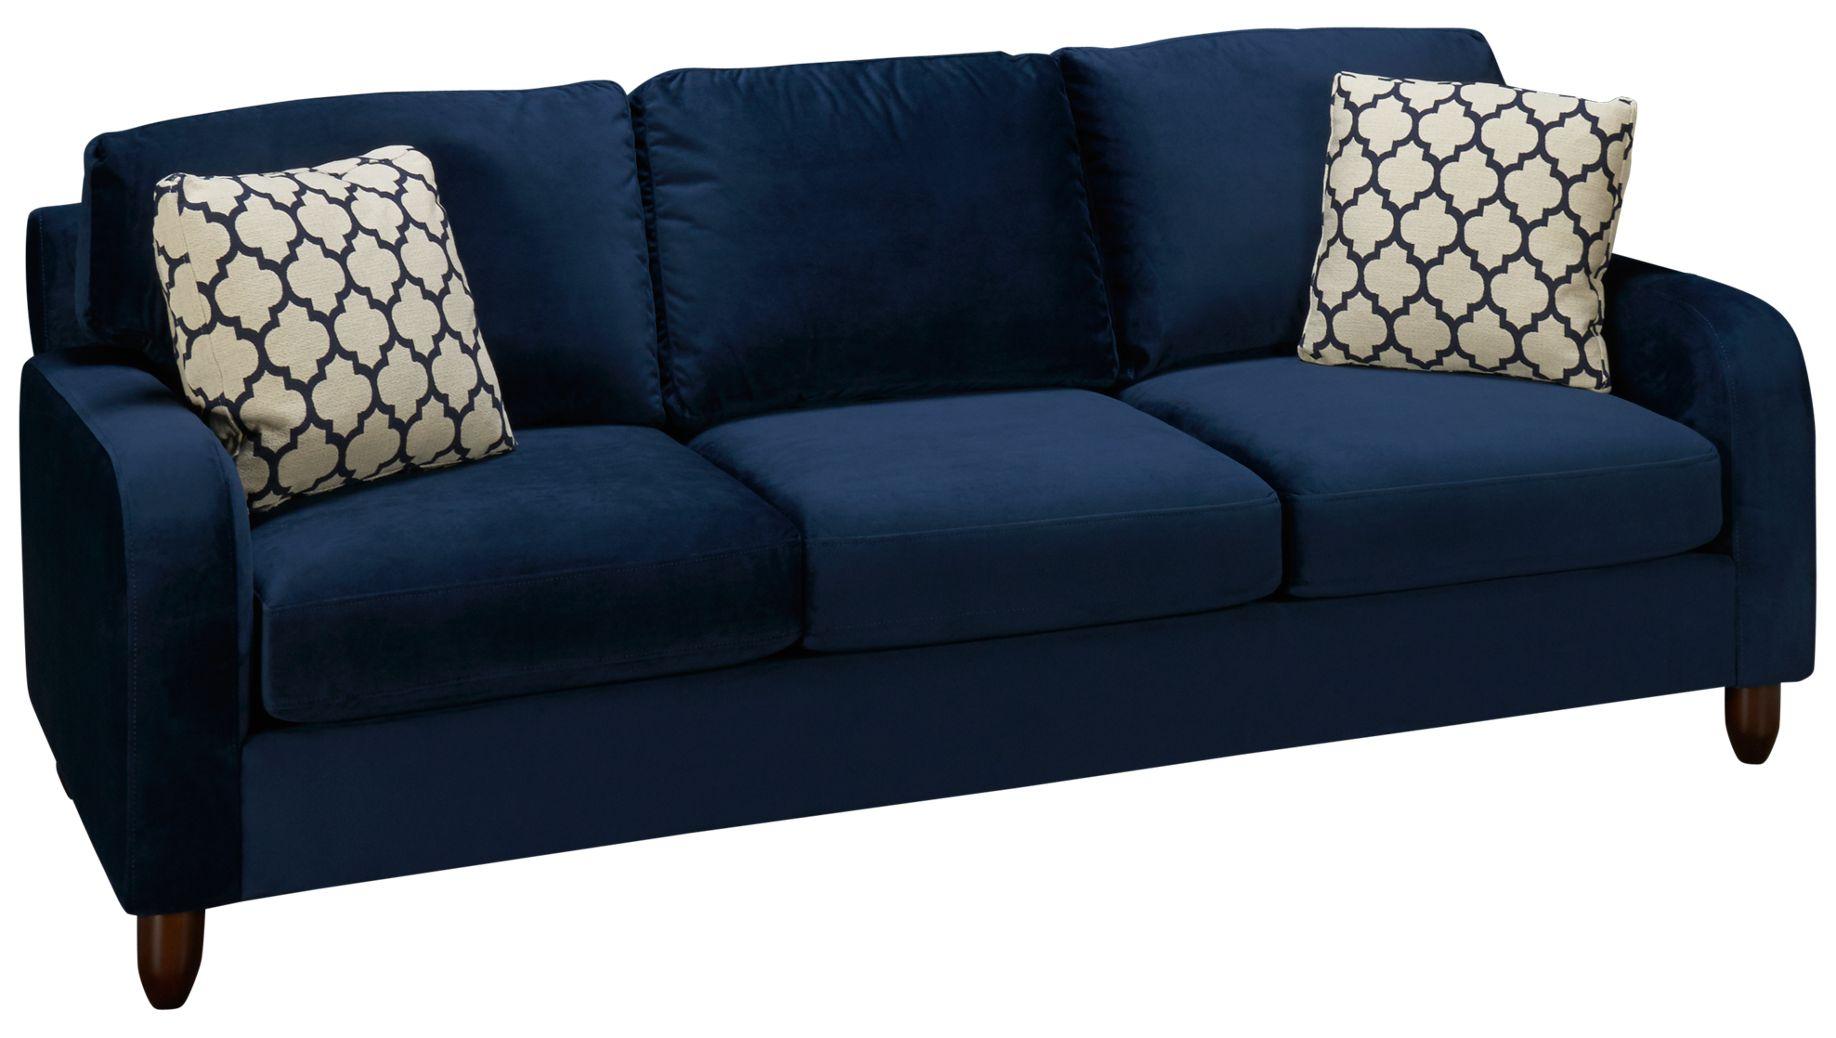 Sorrento Bedroom Furniture Max Home Sorrento Max Home Sorrento Sofa Jordans Furniture